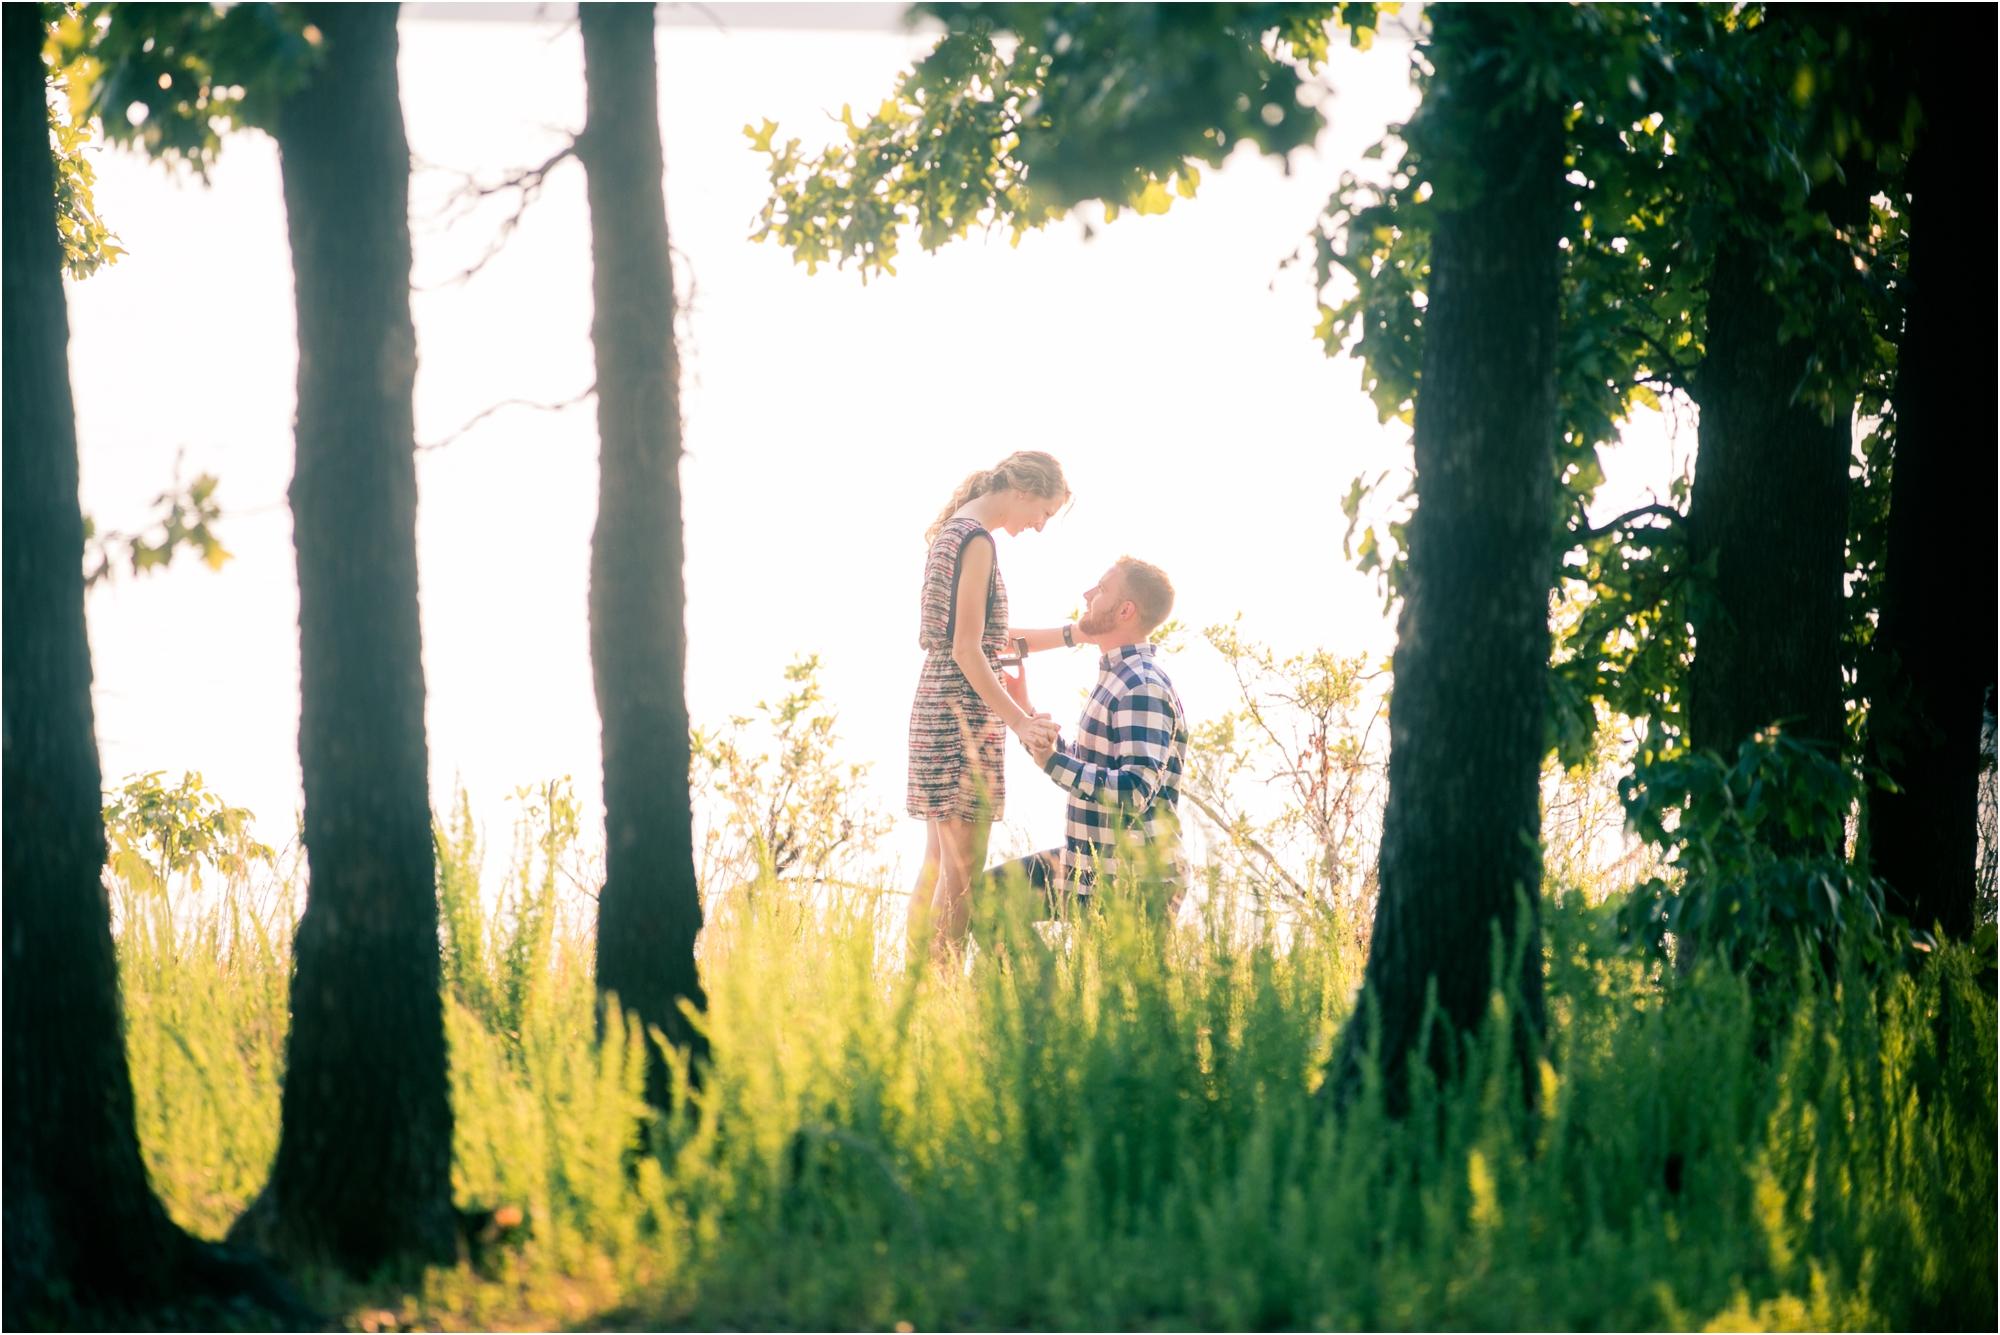 David and Jaelyn Proposal - Jordan Brittley Photography